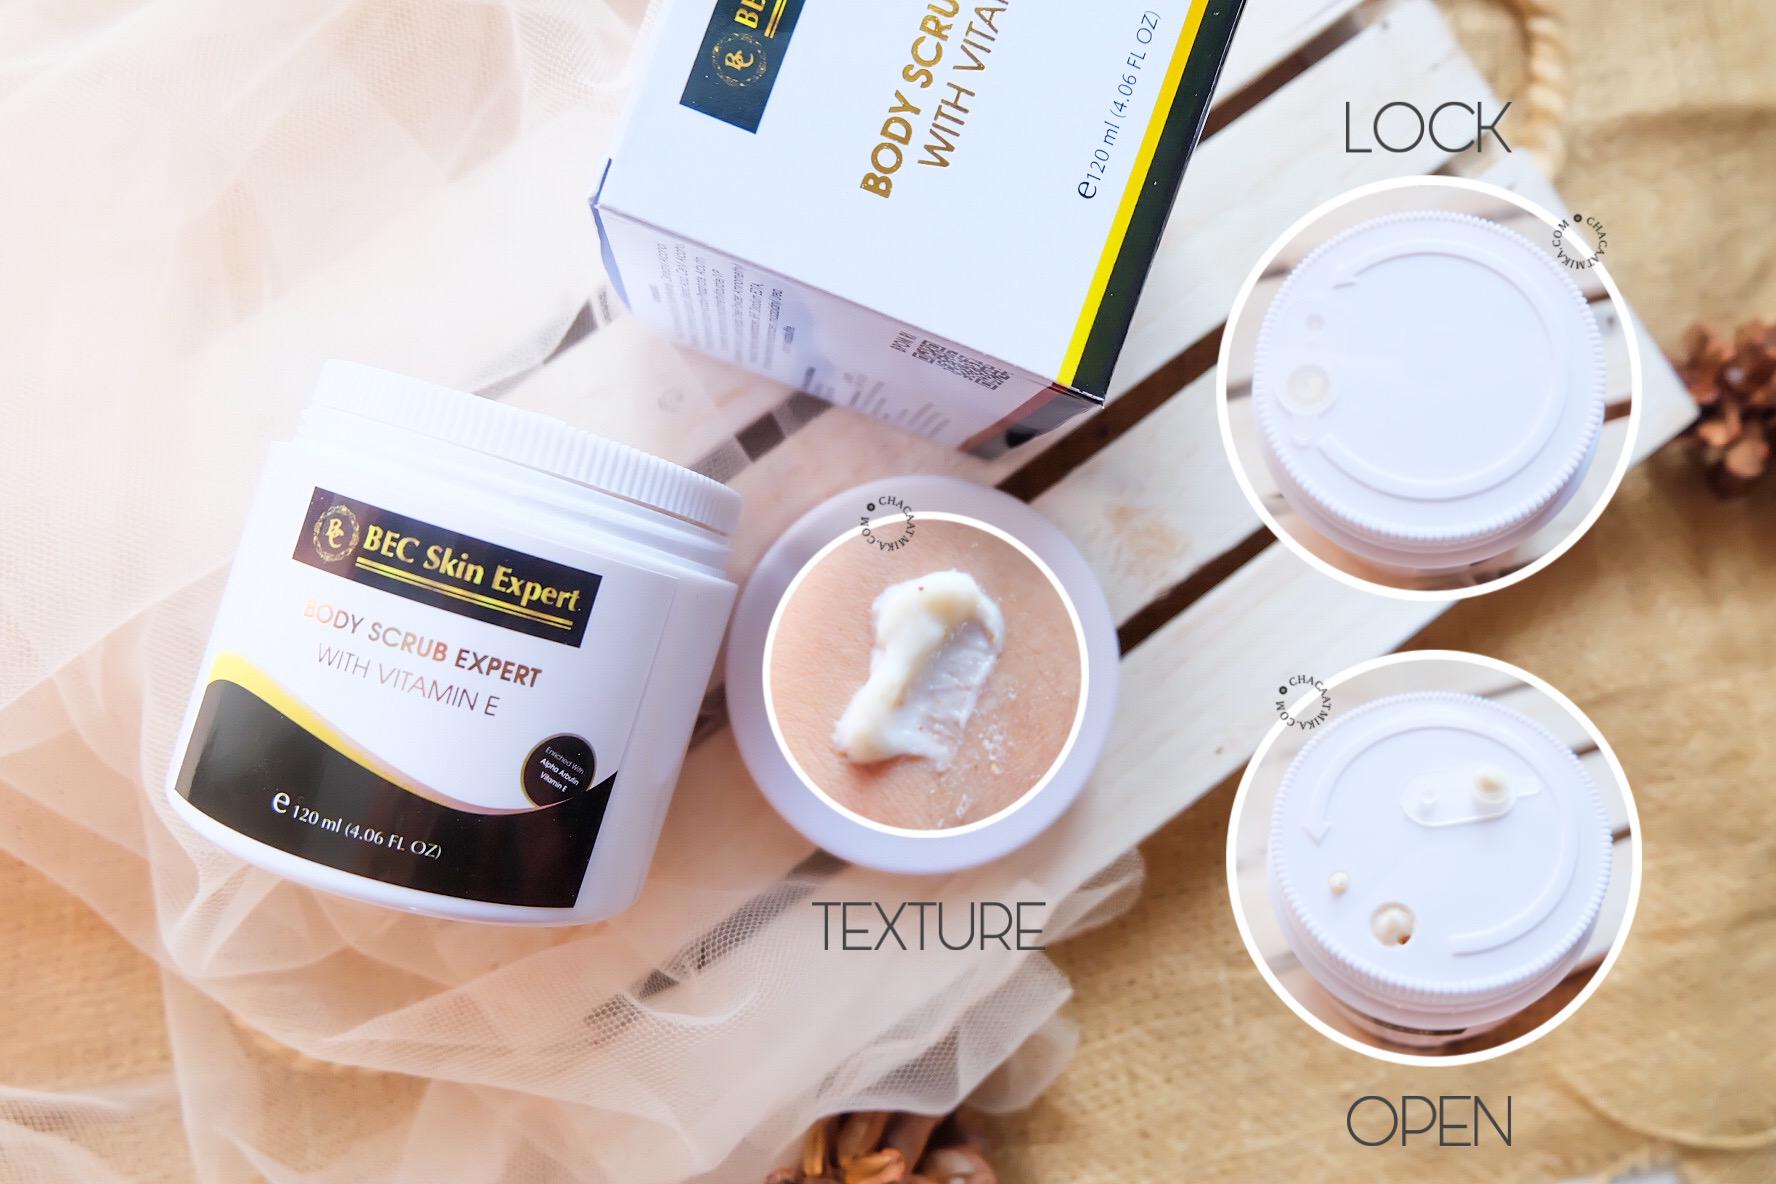 Manfaat Body Scrub Expert BEC Skin Expert